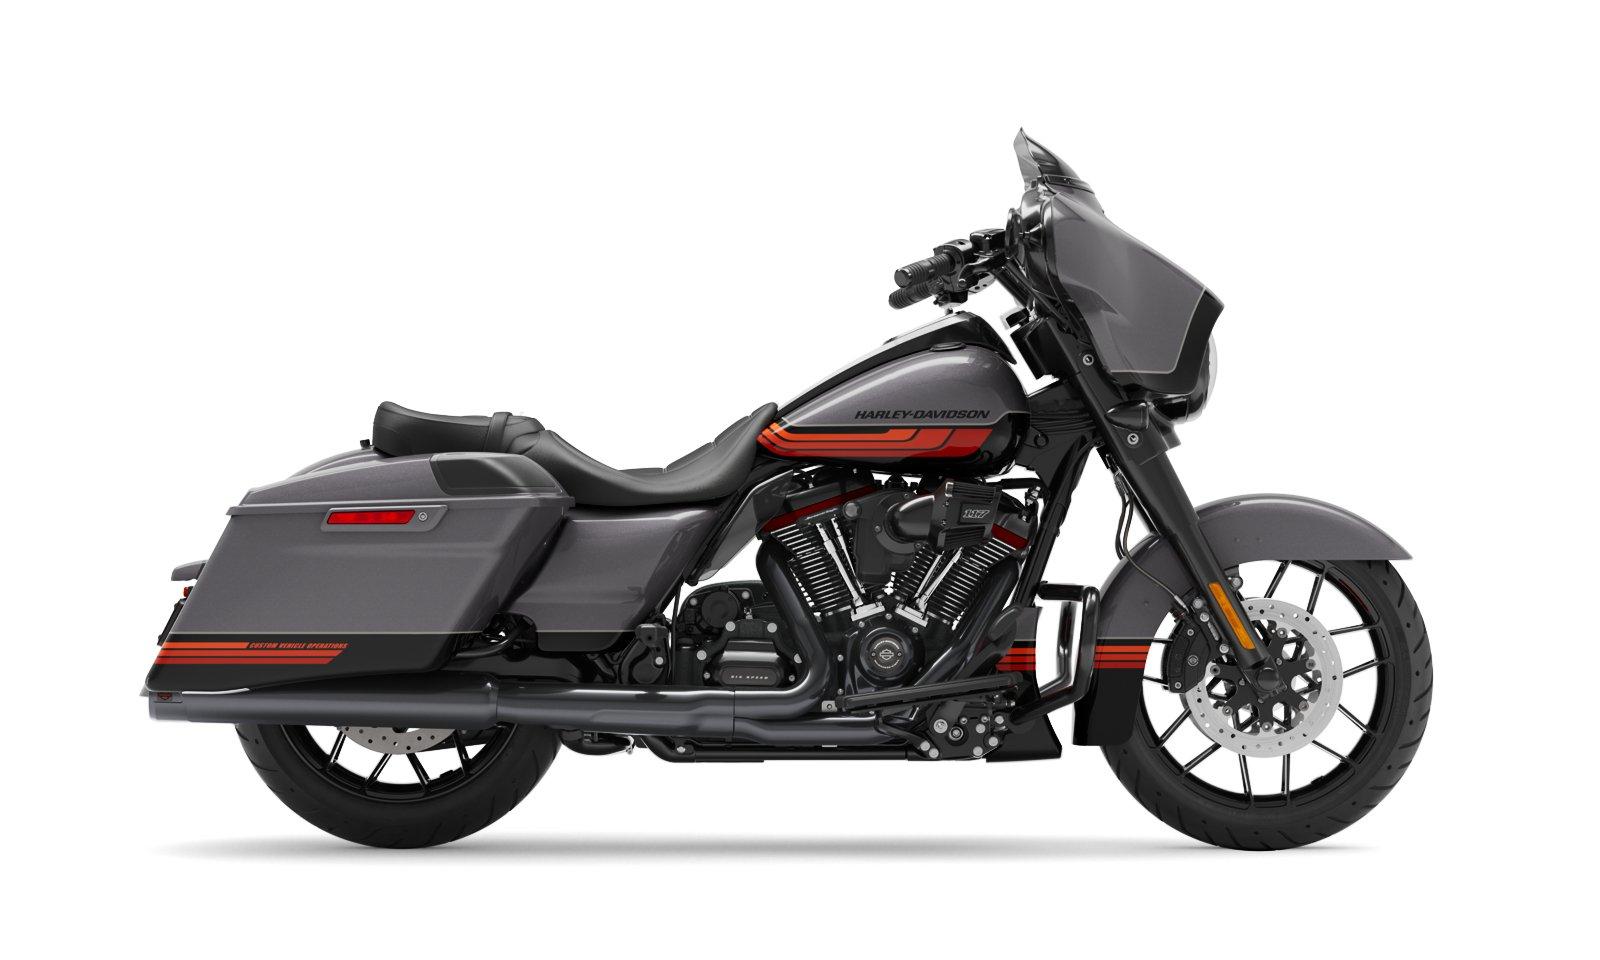 2020 Halloween At Harley Davidson 2020 CVO Street Glide Motorcycle | Harley Davidson USA